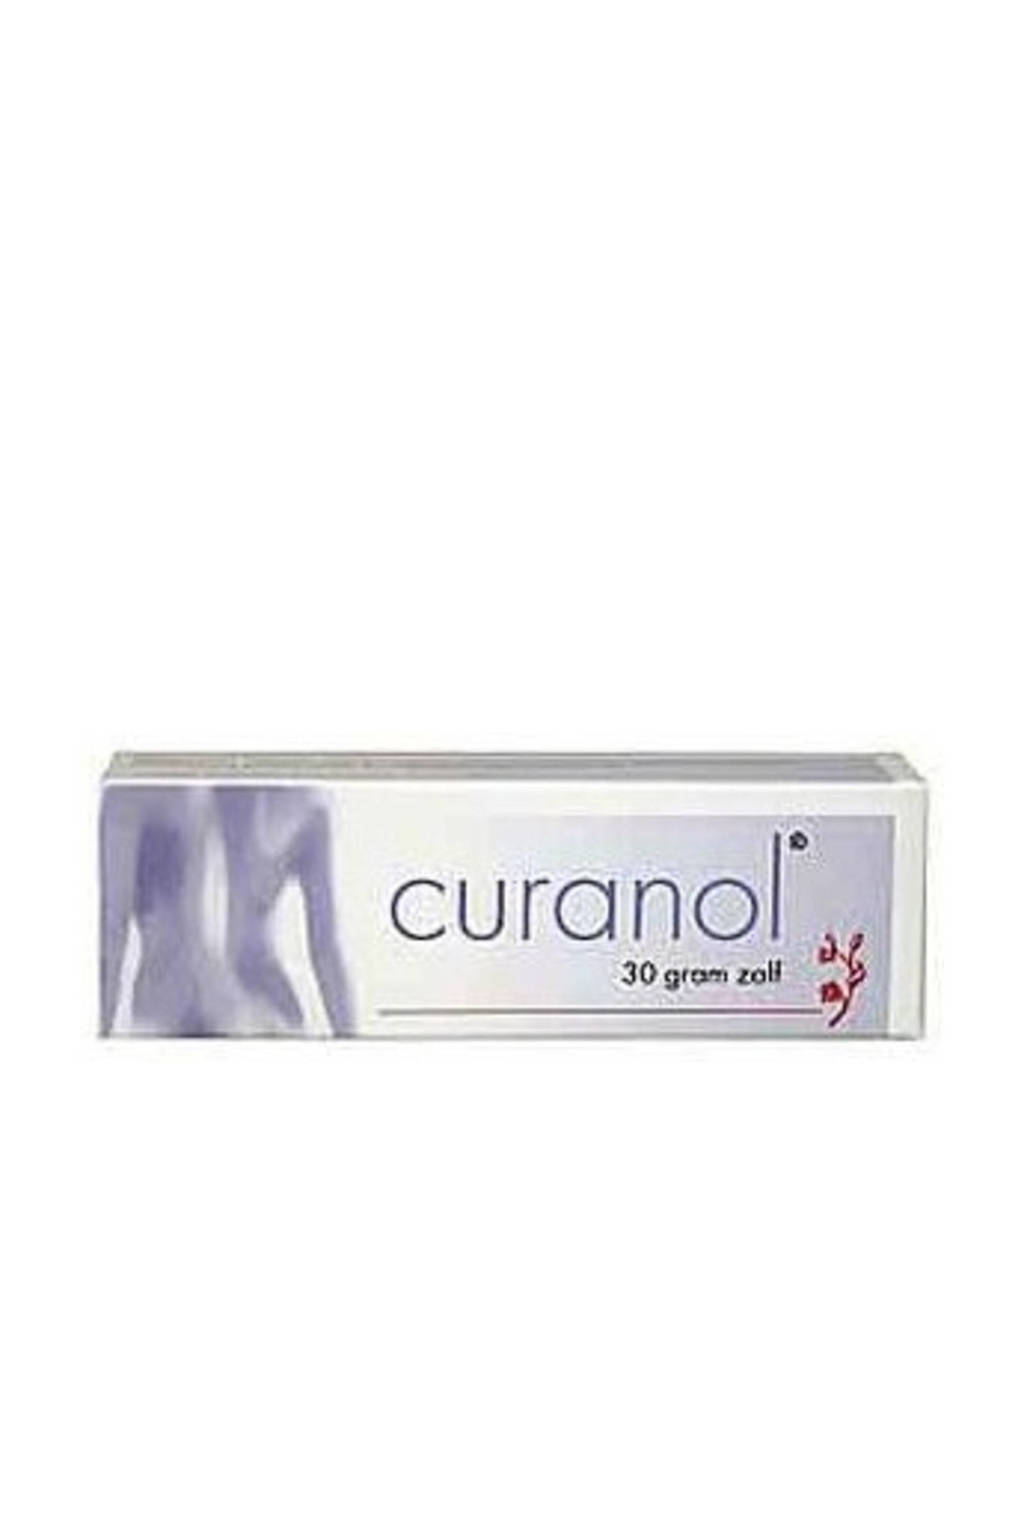 Curanol Aambeien zalf - 30 gr